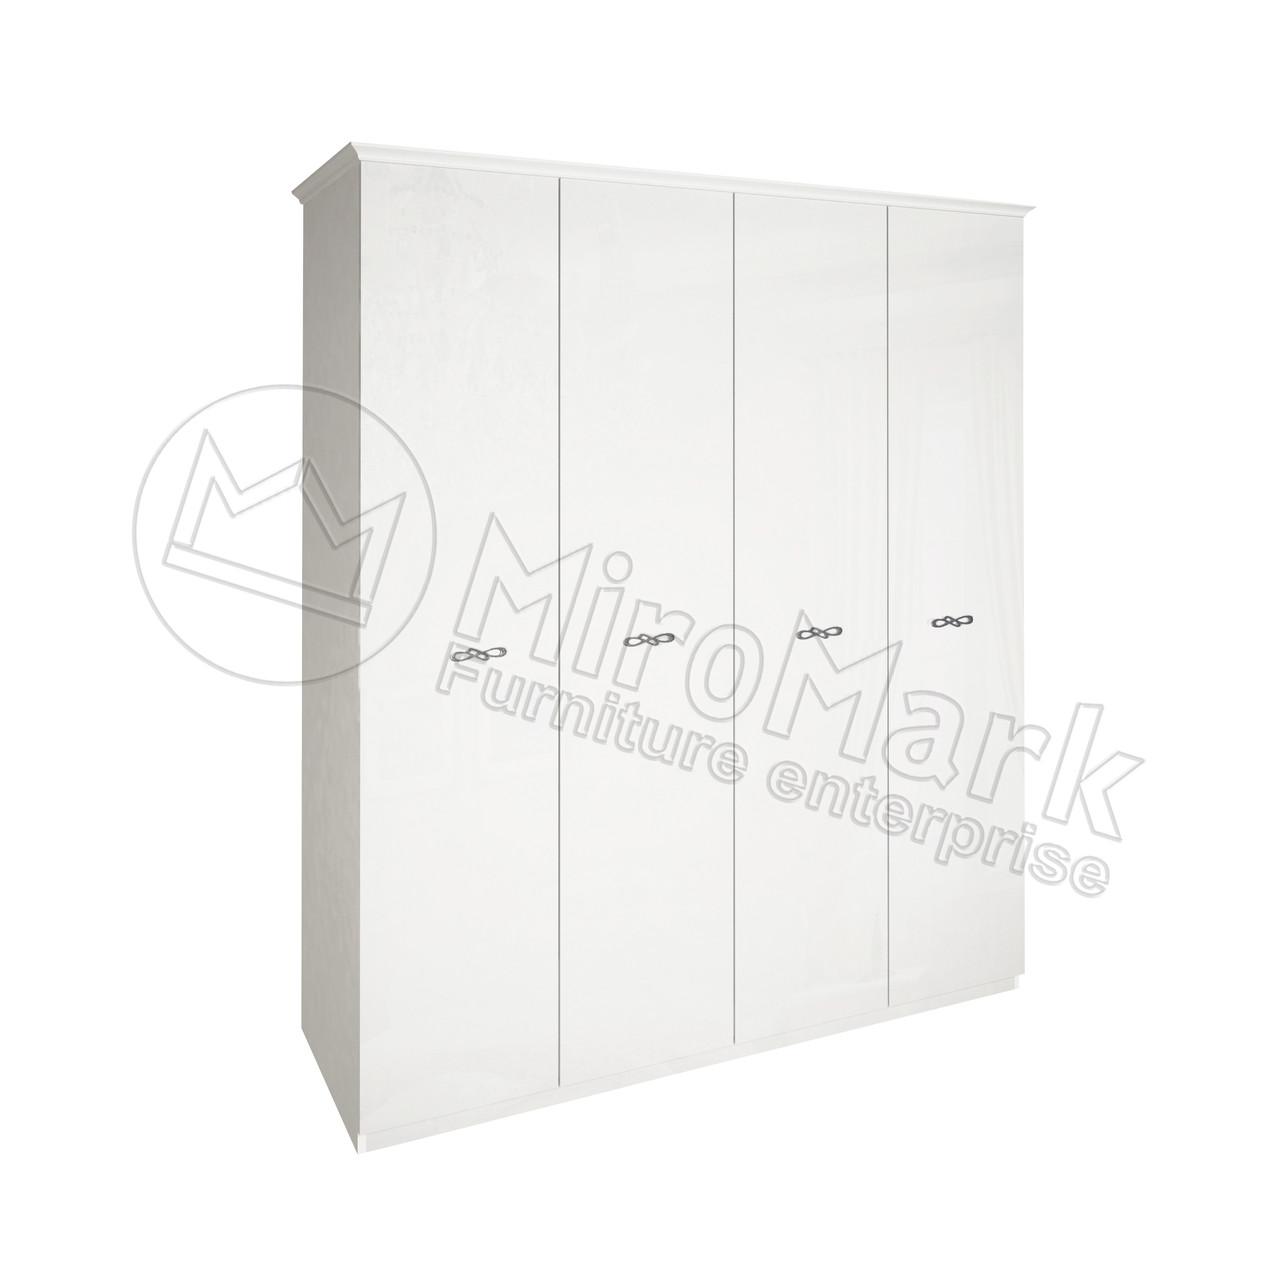 Шкаф Прованс 4 дв без зеркал Глянец белый ТМ Миро-Марк